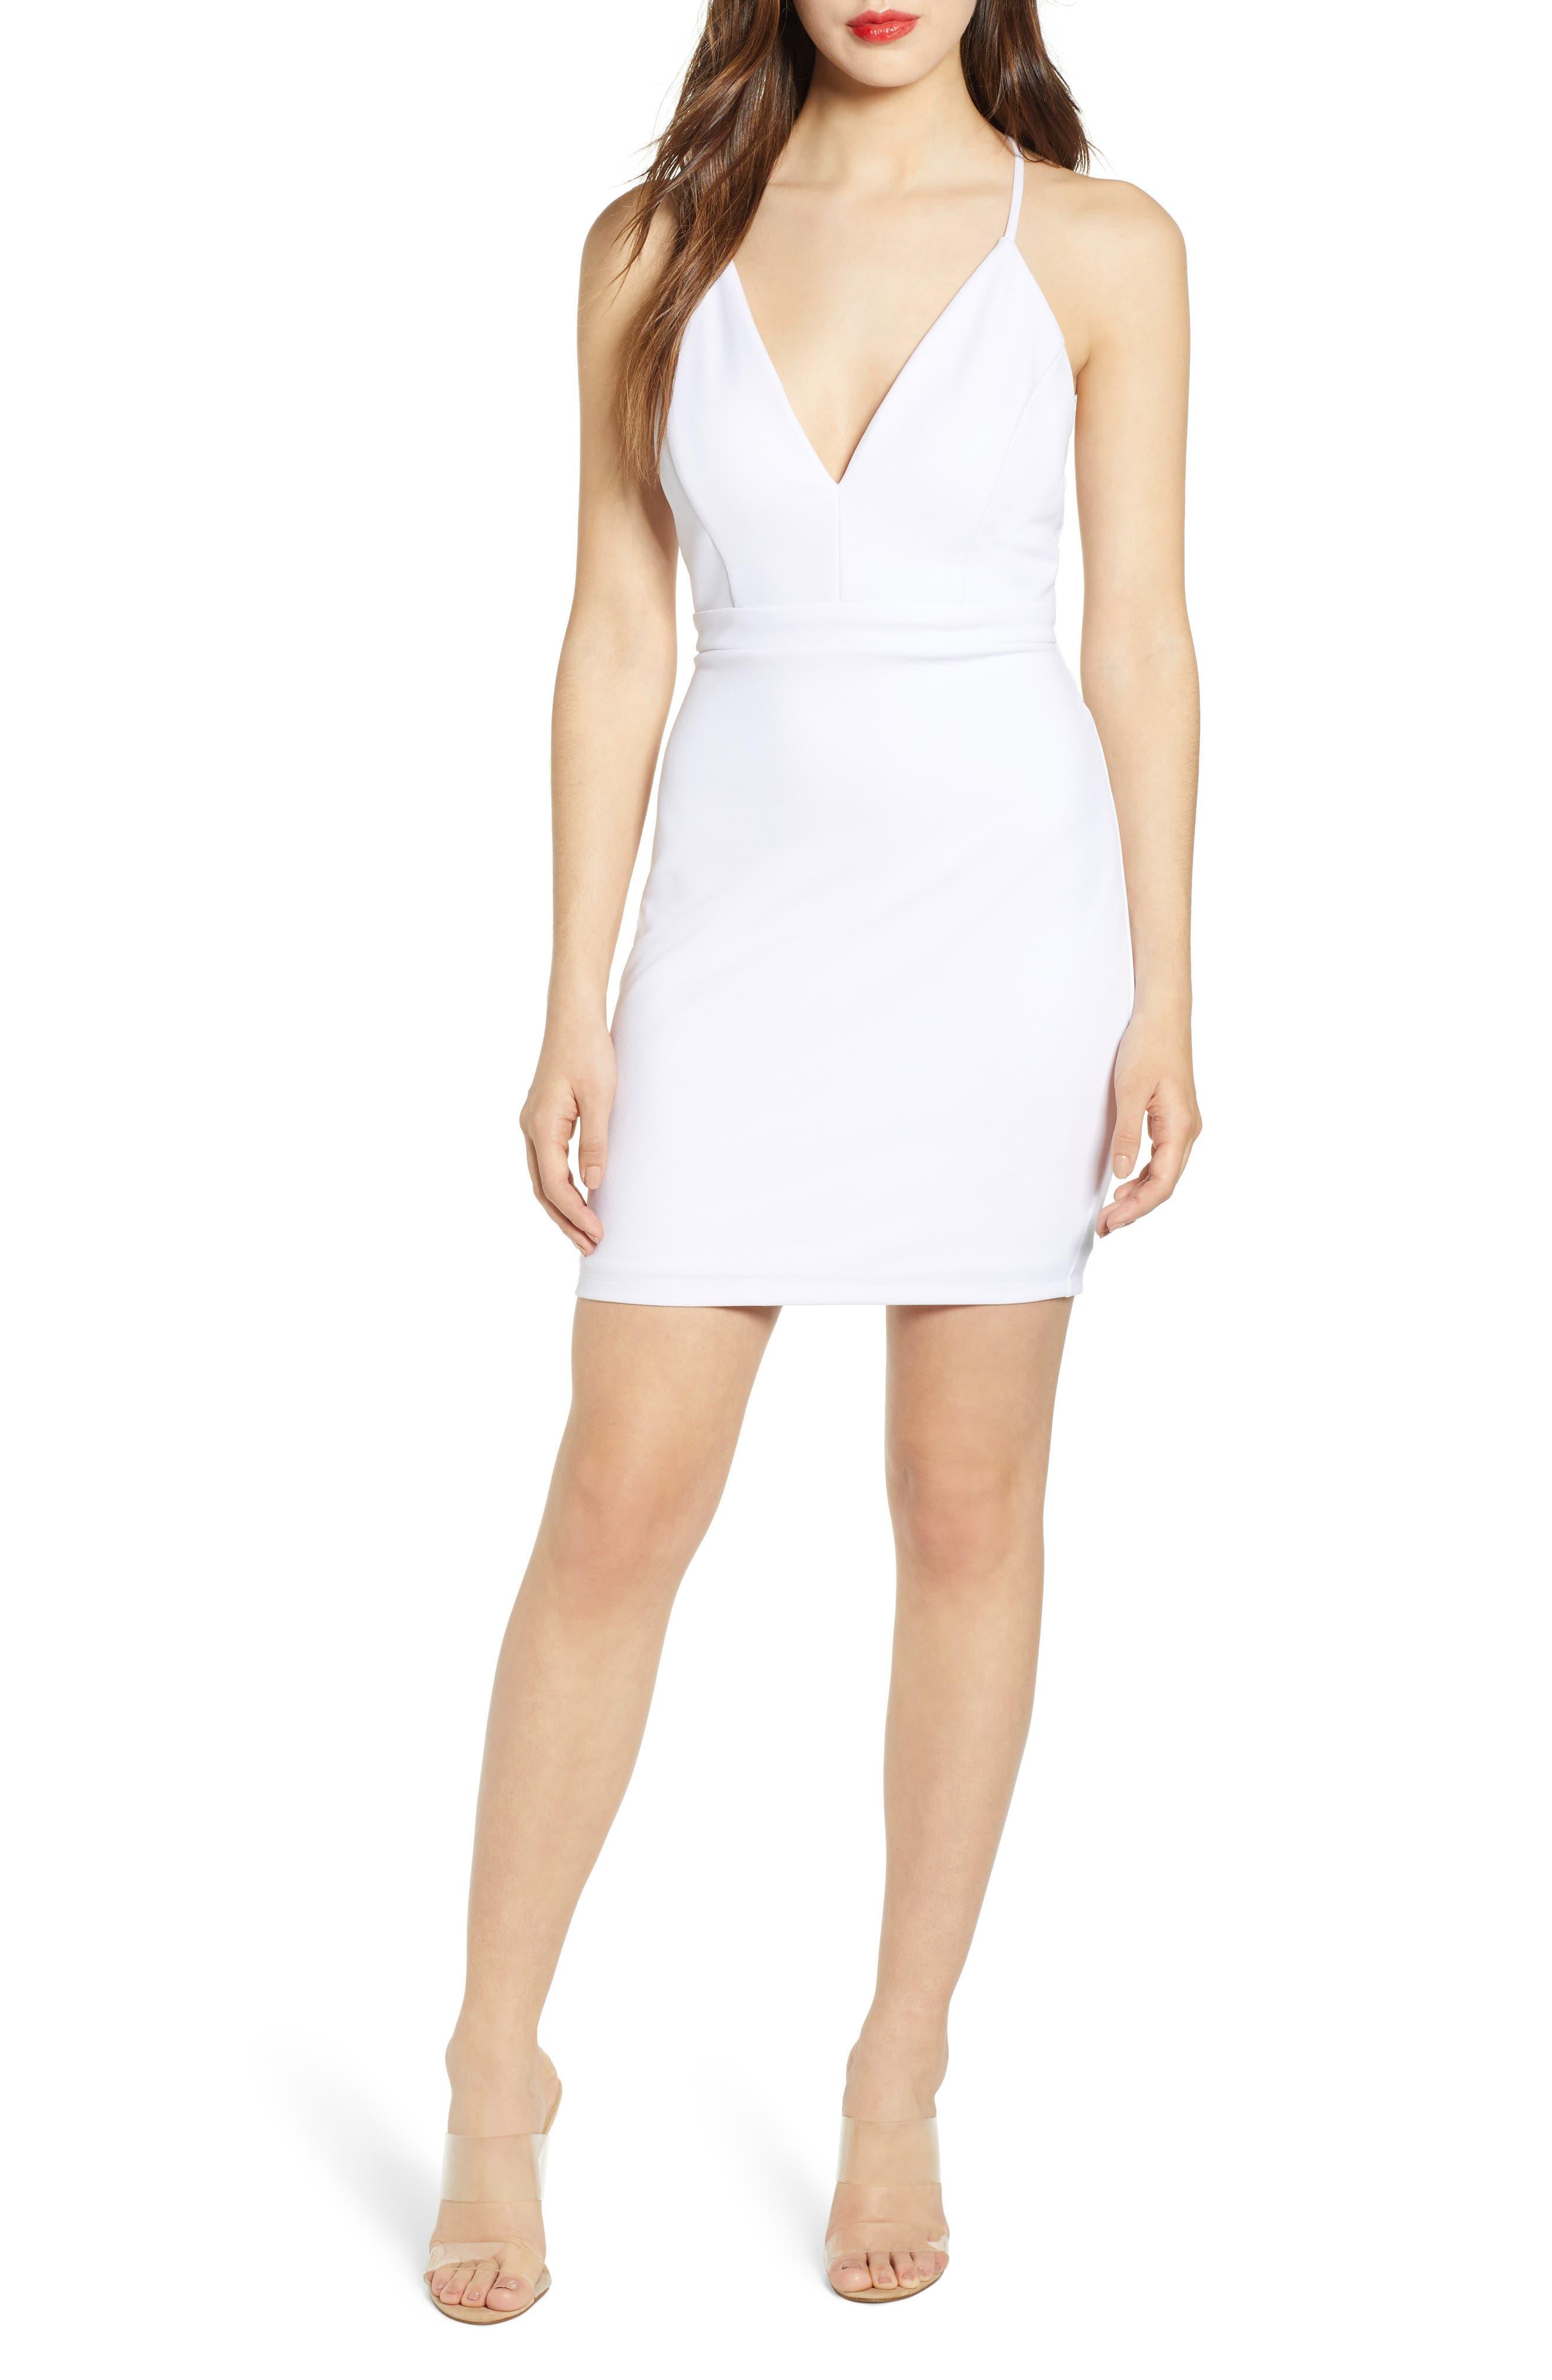 Love, Nickie Lew Illusion Detail Body-Con Dress, White